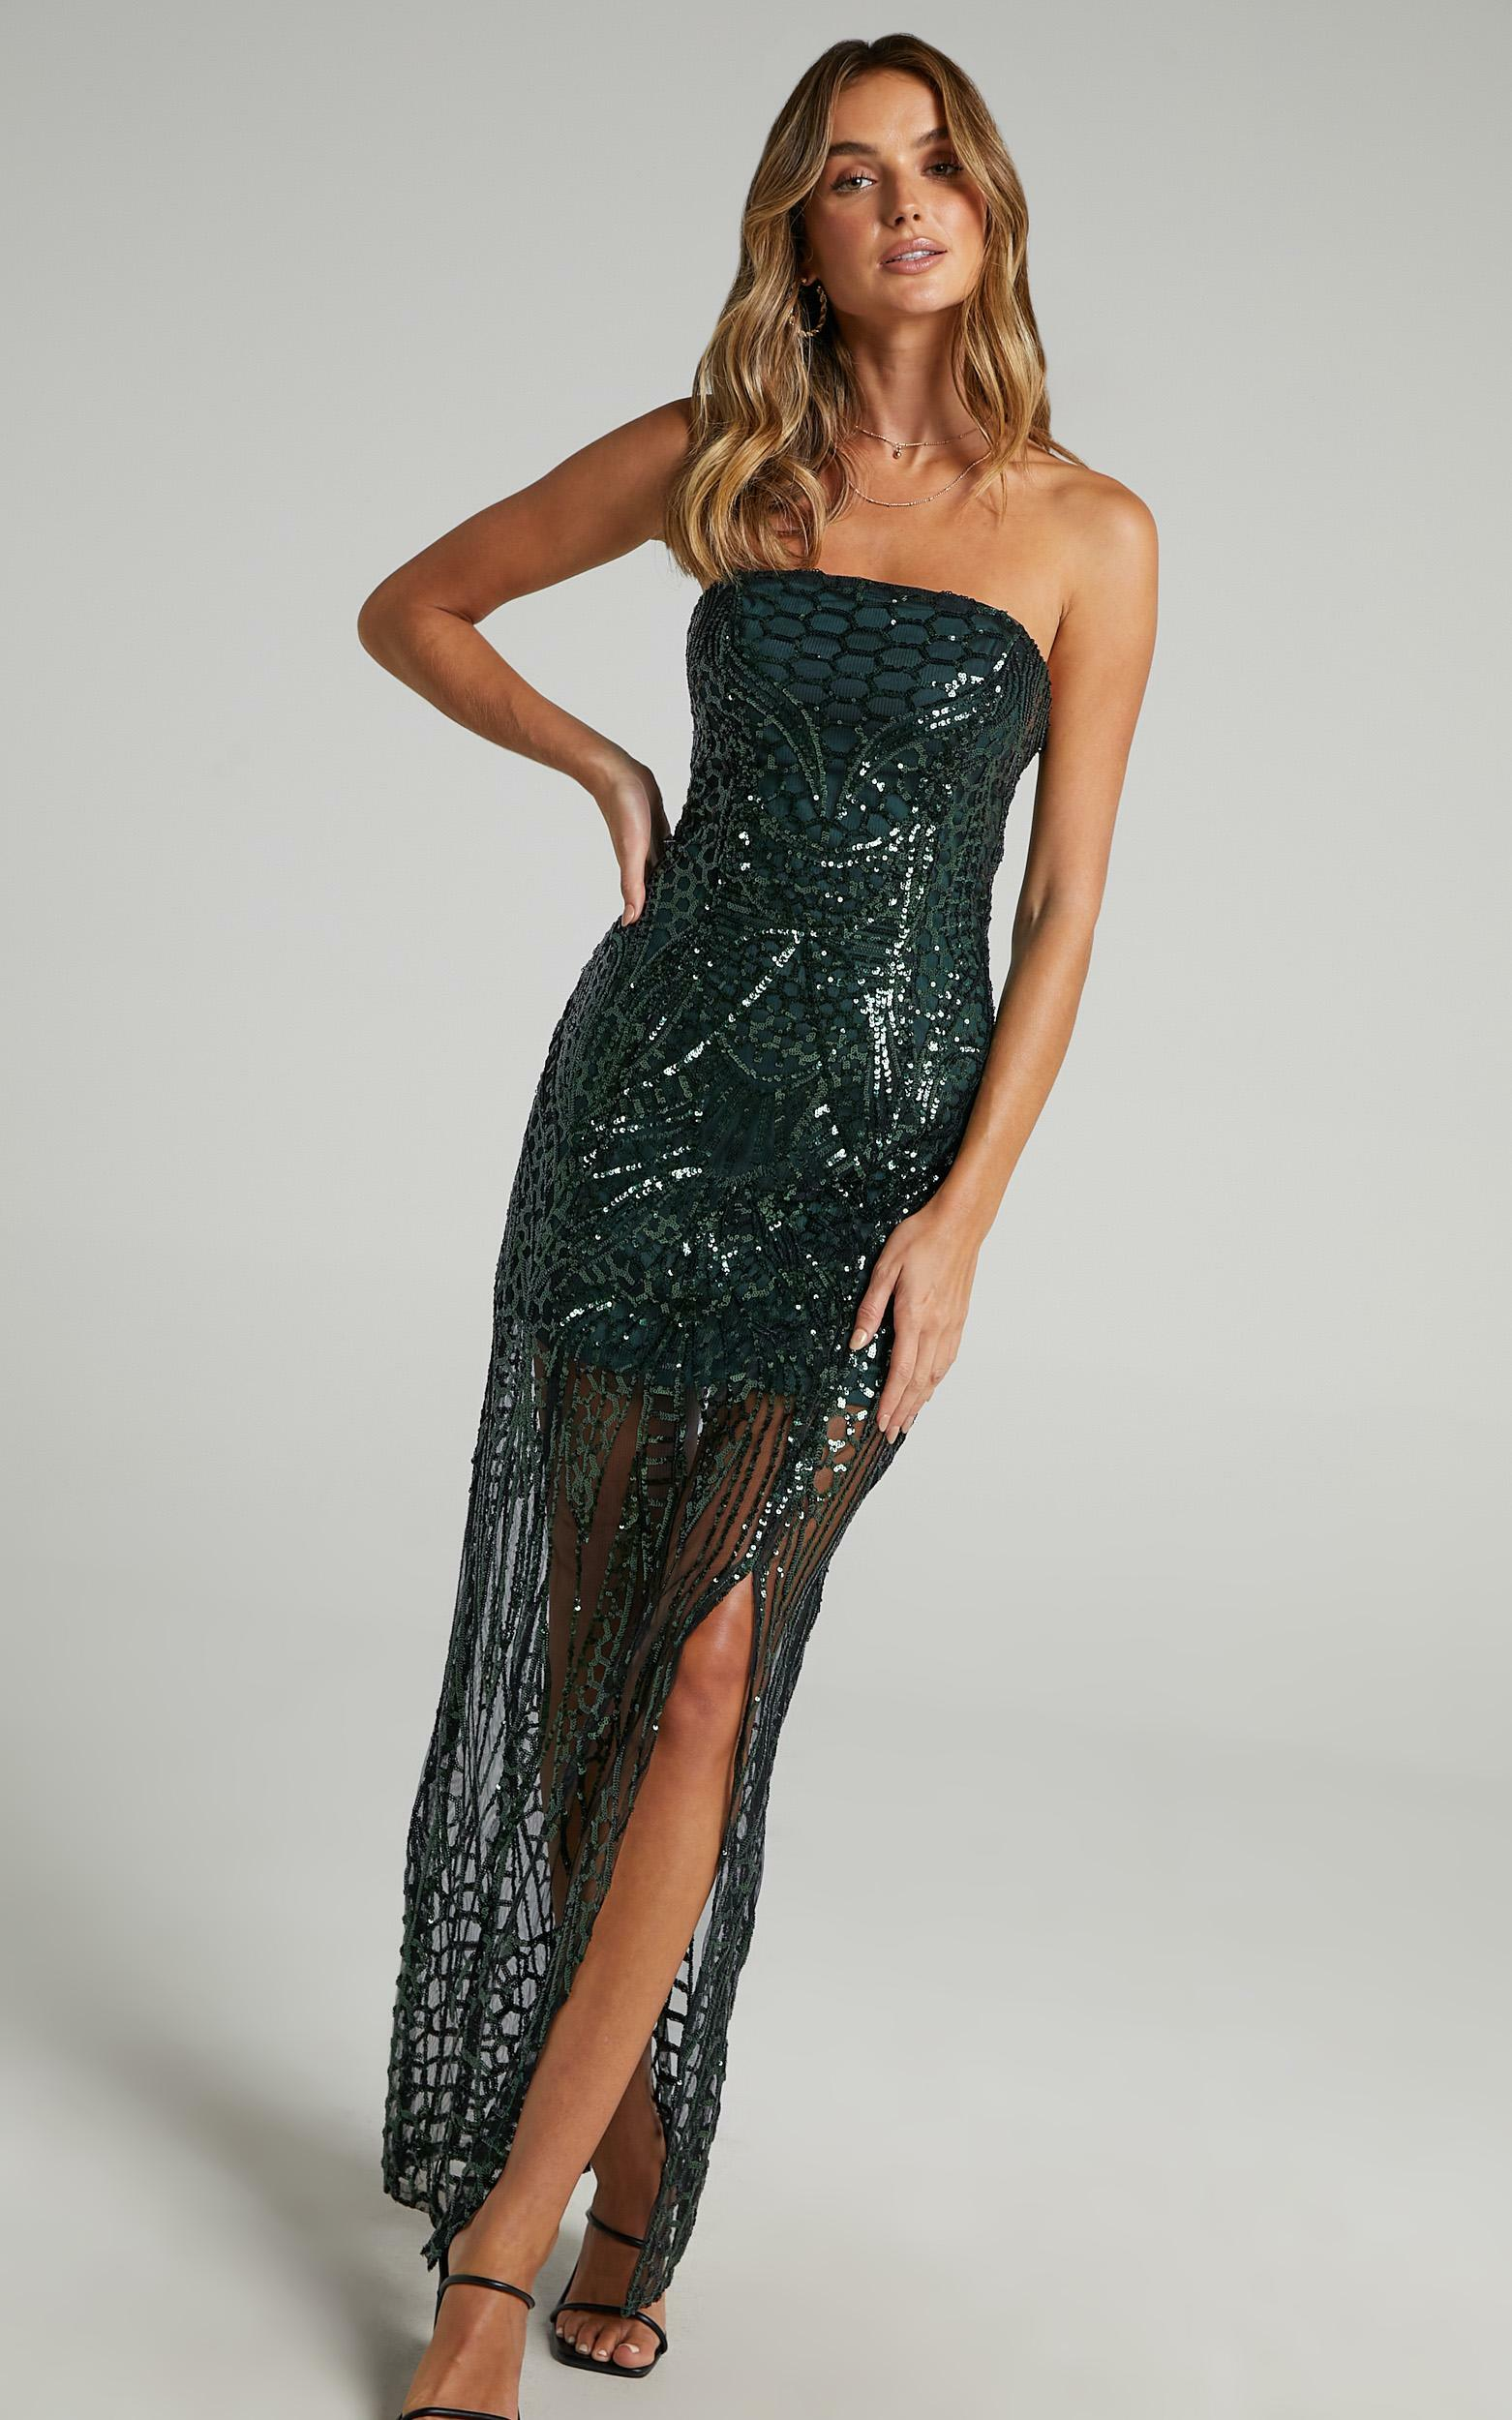 American Hero Maxi Dress in Emerald Sequin - 20, GRN1, hi-res image number null